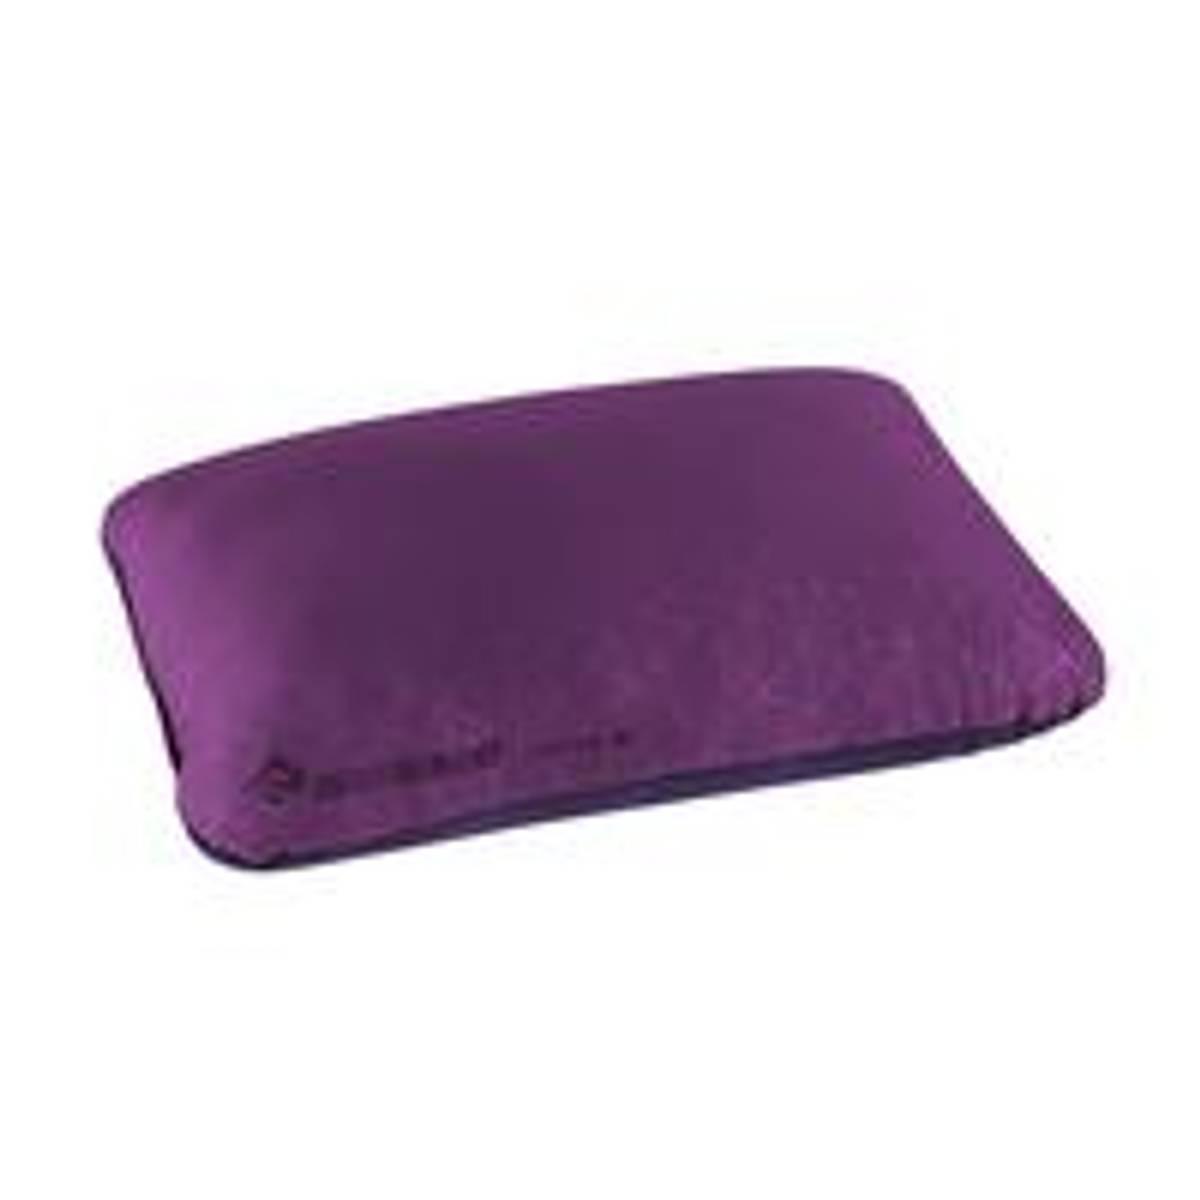 Sea To Summit FoamCore Pillow Deluxe Magenta